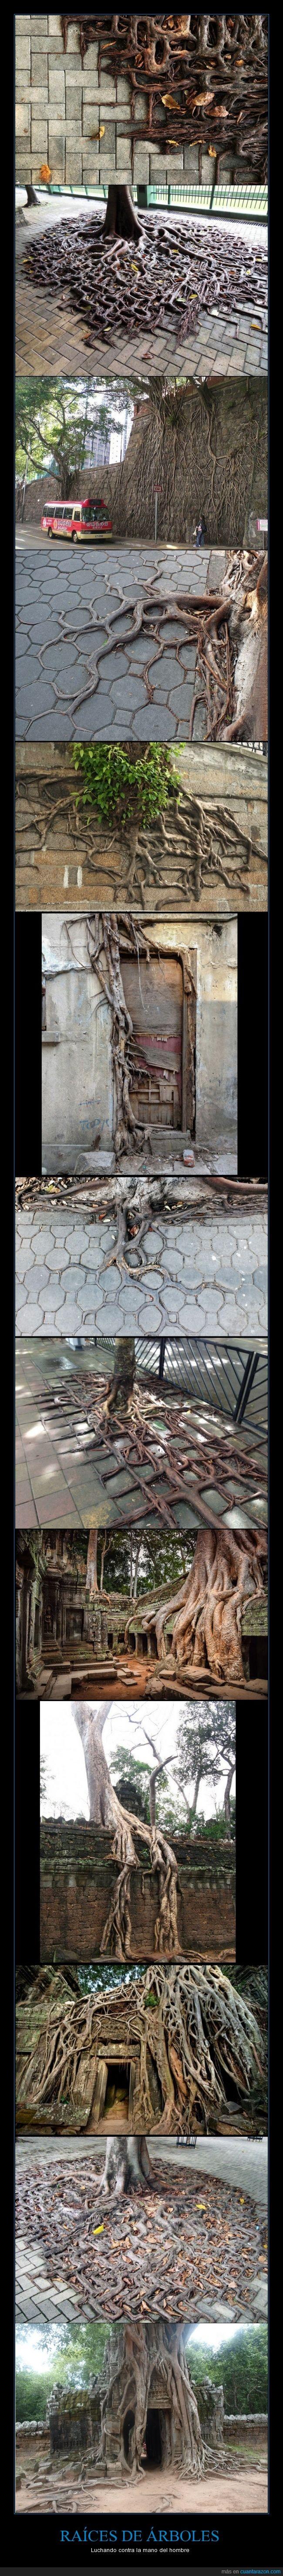 árboles,contra,del,hombre,luchando,mano,naturaleza,raíces